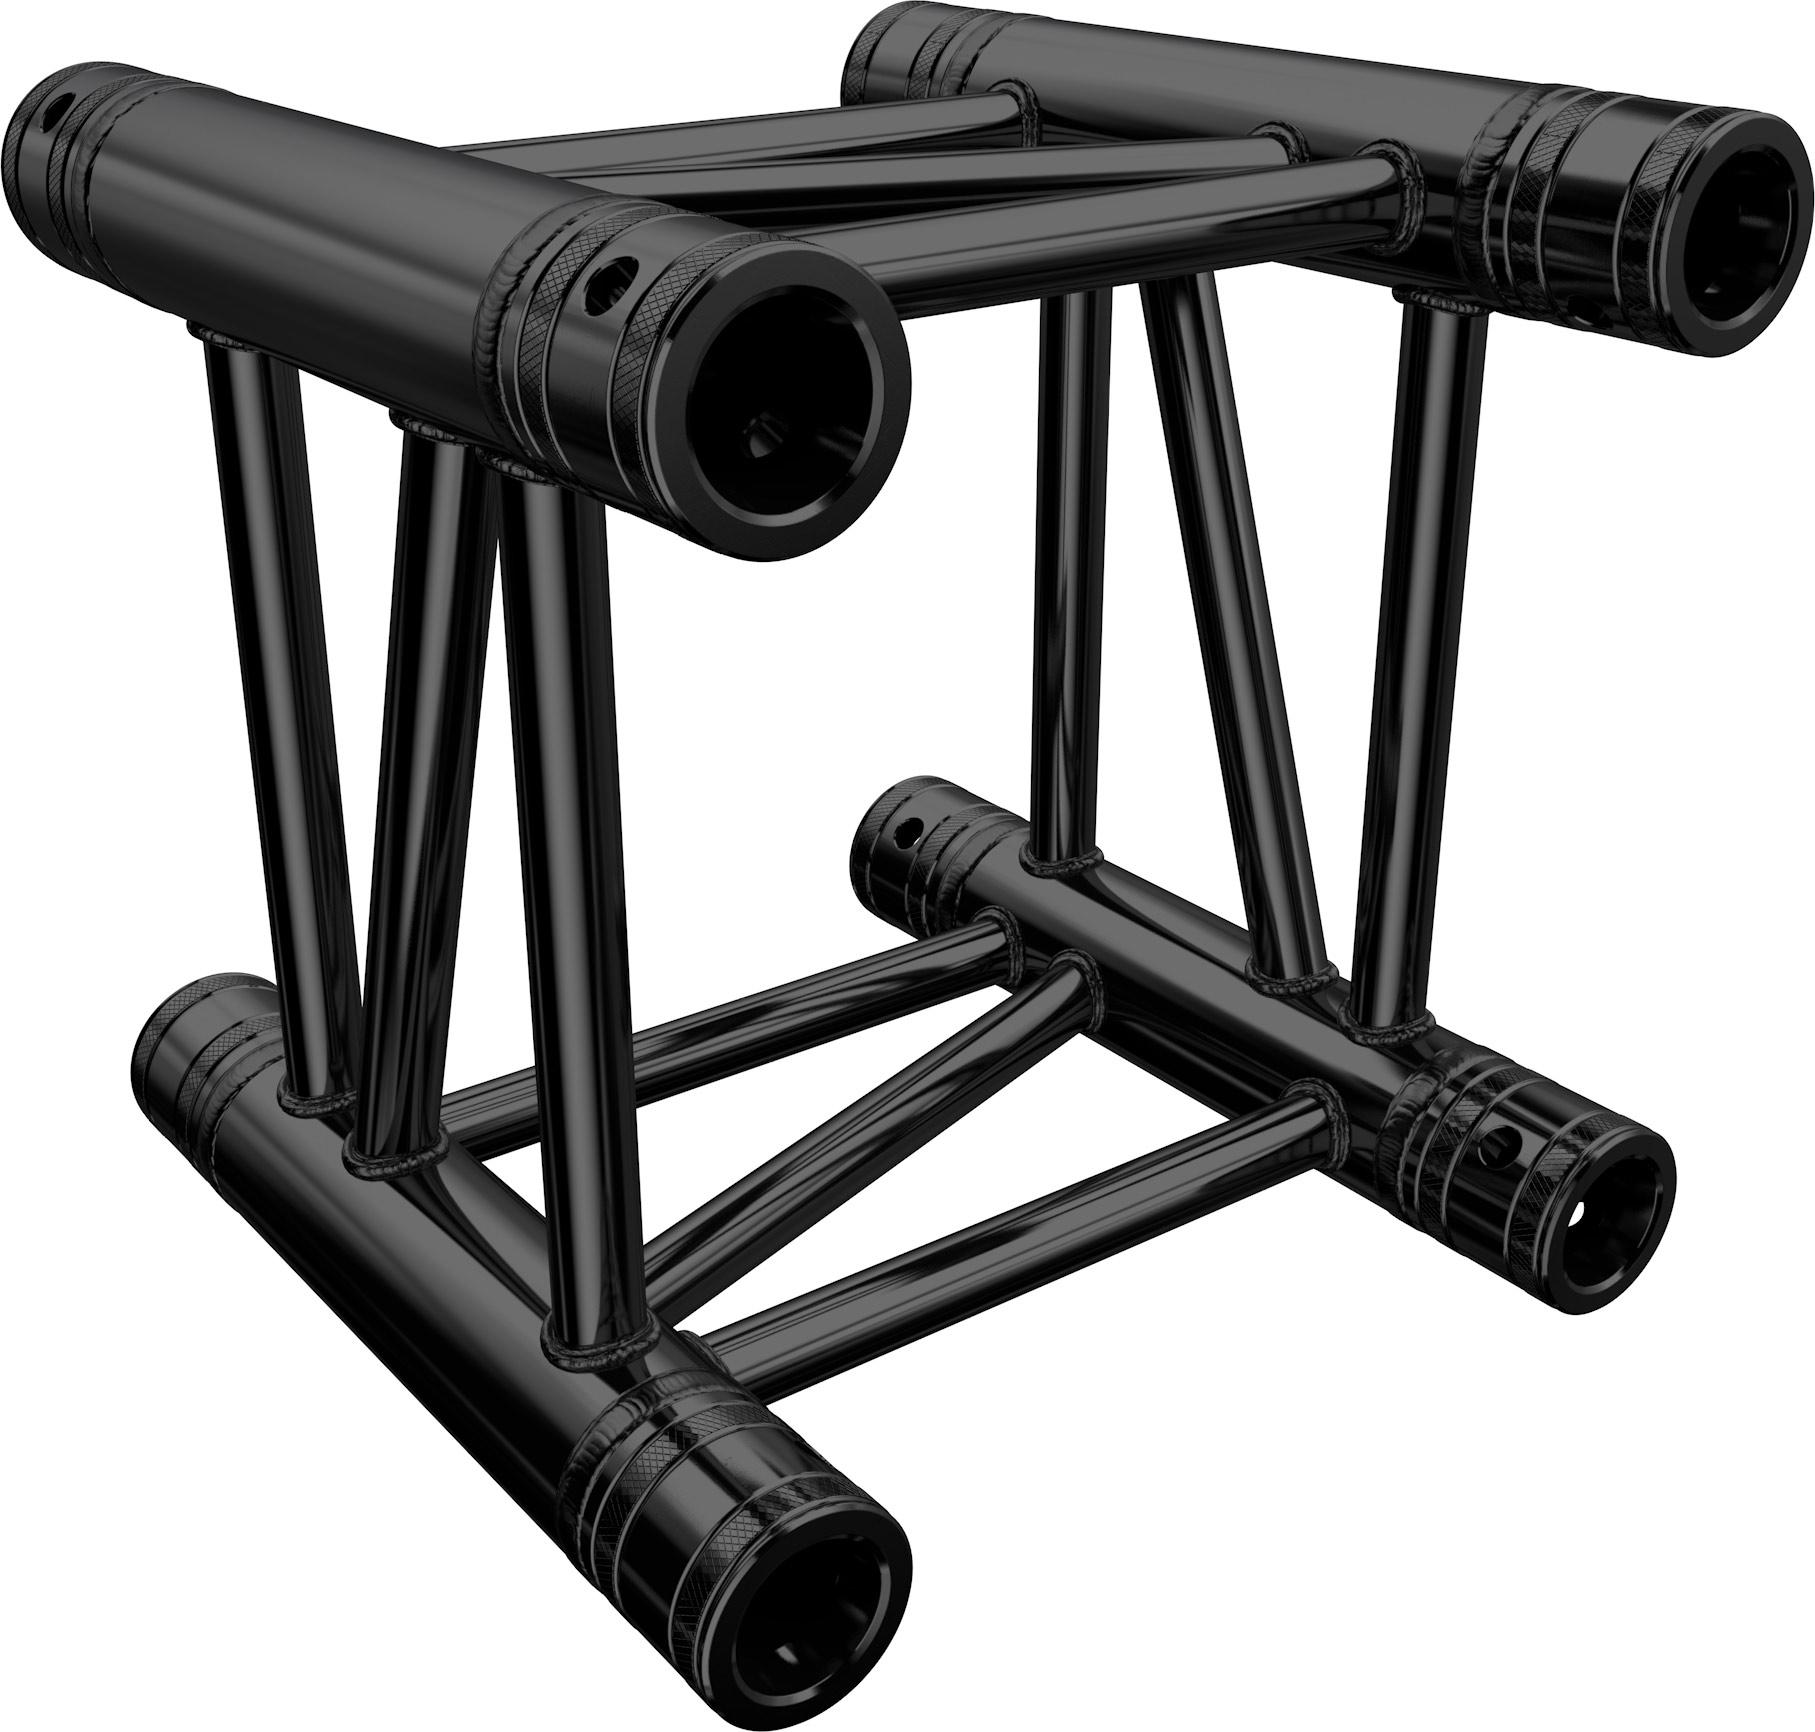 Global Truss Traverse F34 29 cm Stage Black